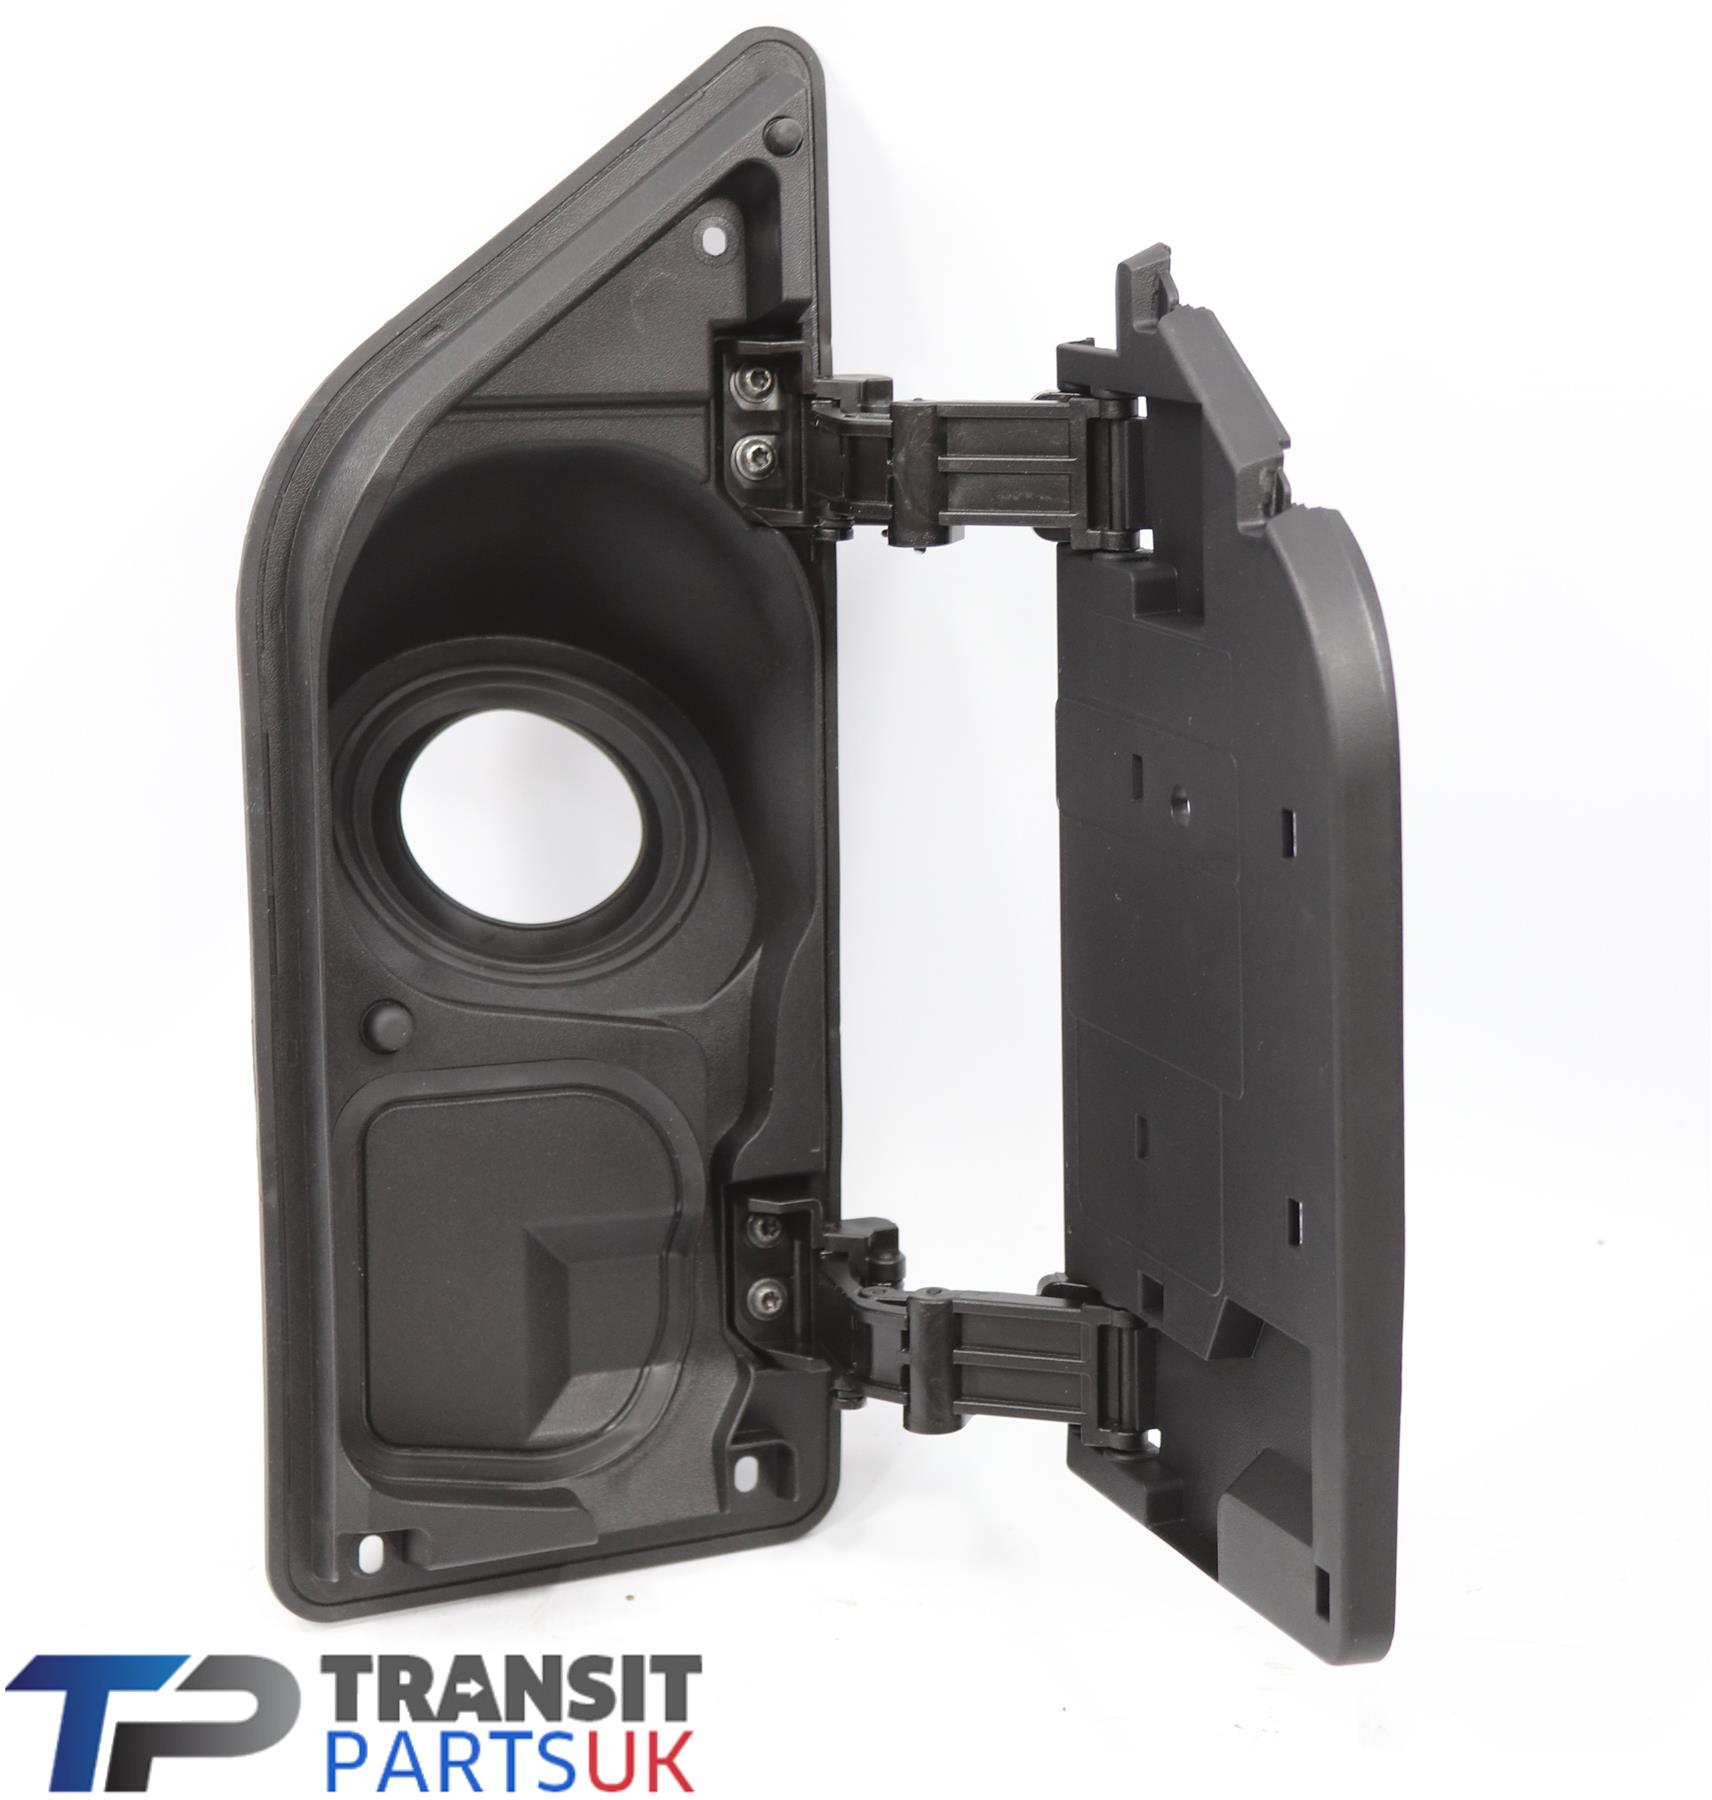 Transit Parts Transit MK8 Fuel Tank Housing Flap Door Cover 2014 On New Oe 1829959